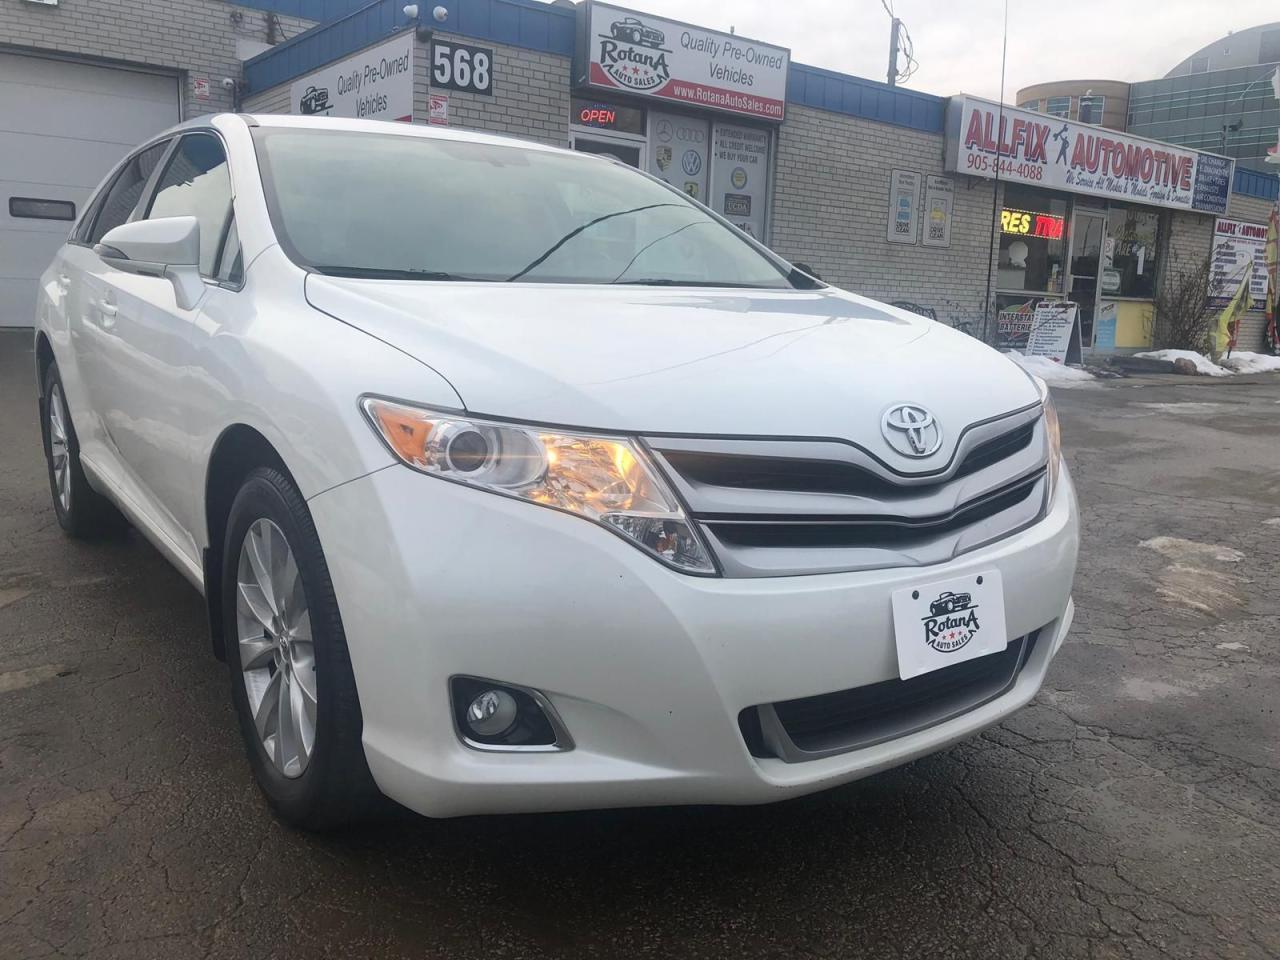 2013 Toyota Venza Navigation_Backup Sensors_Bluetooth_AWD